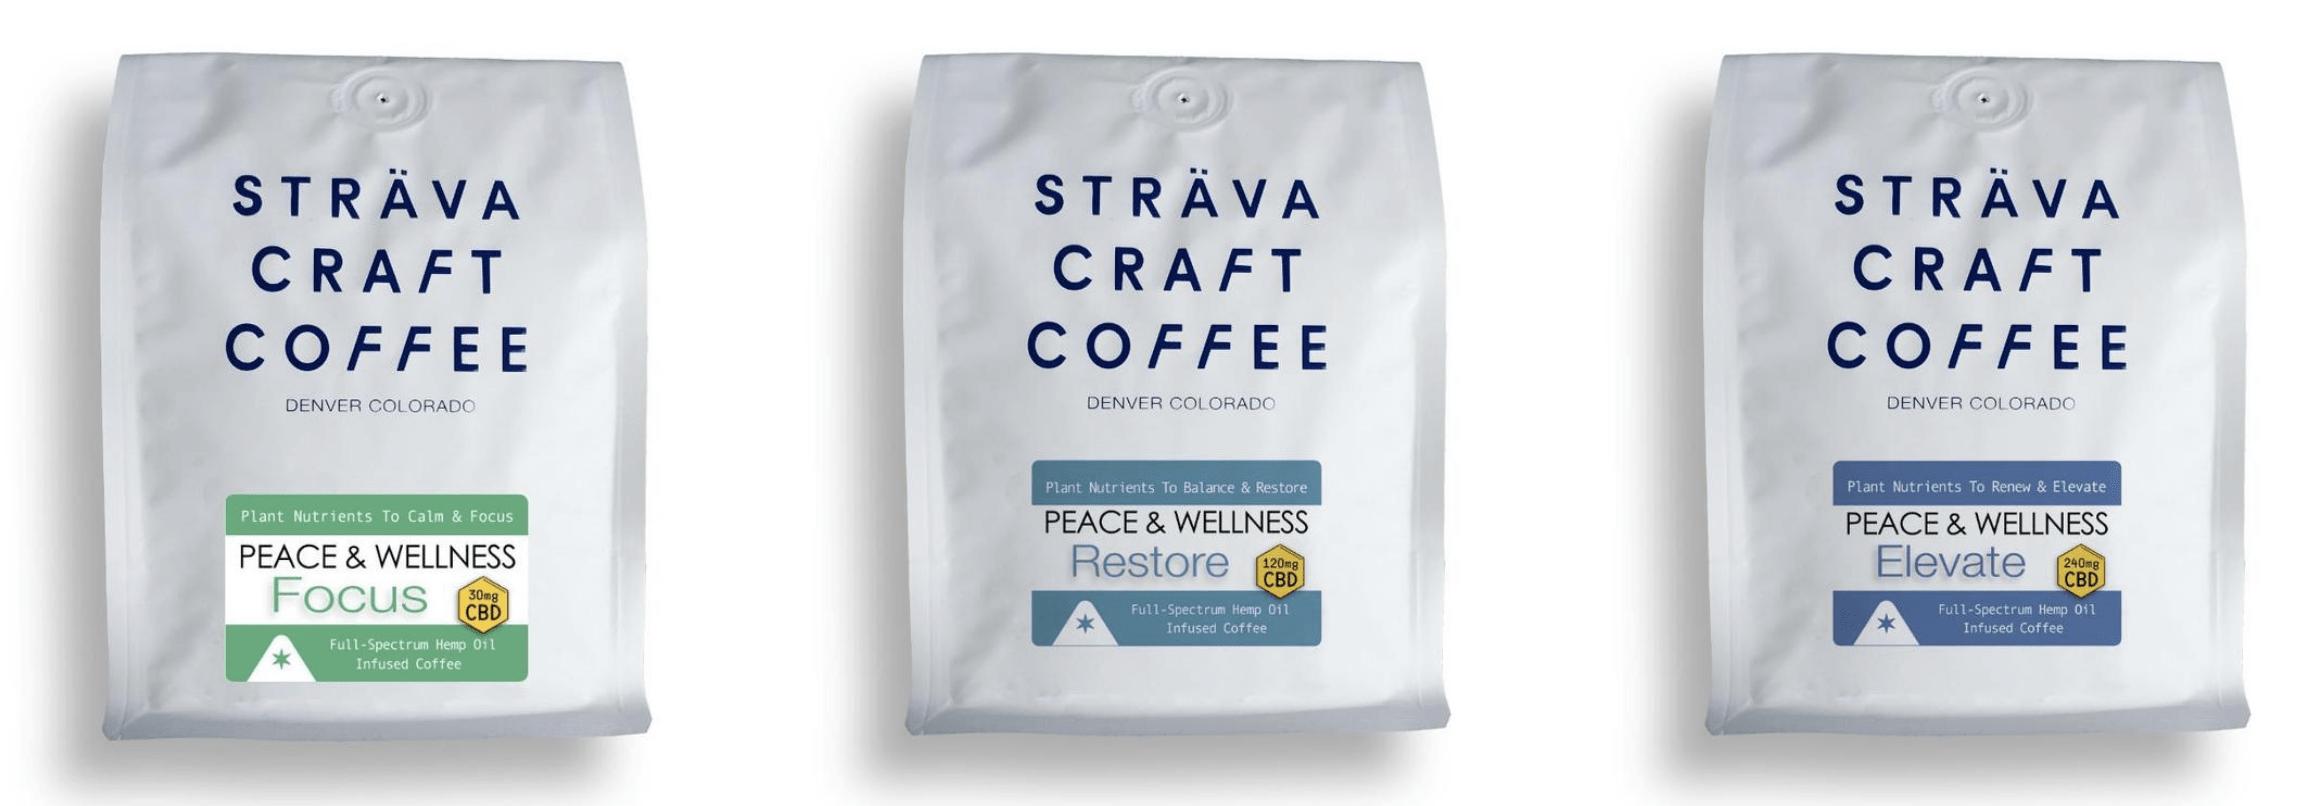 Strava Coffee coupon codes! CBD coffee online.